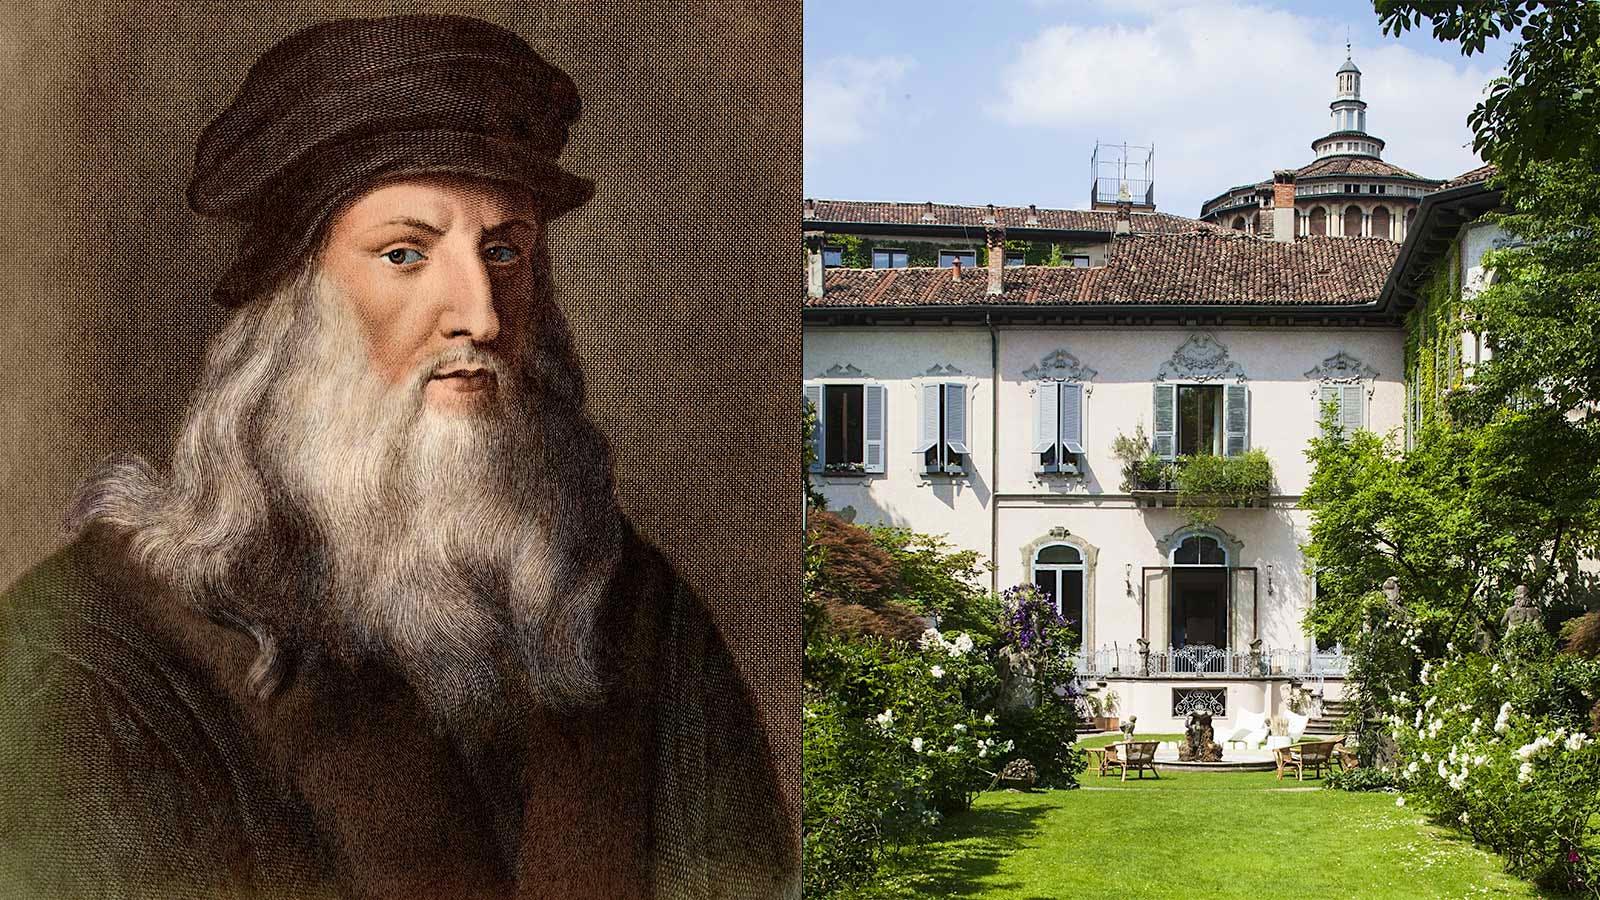 Renaissance Man's Wine Reborn: Inside Leonardo da Vinci's Vineyard